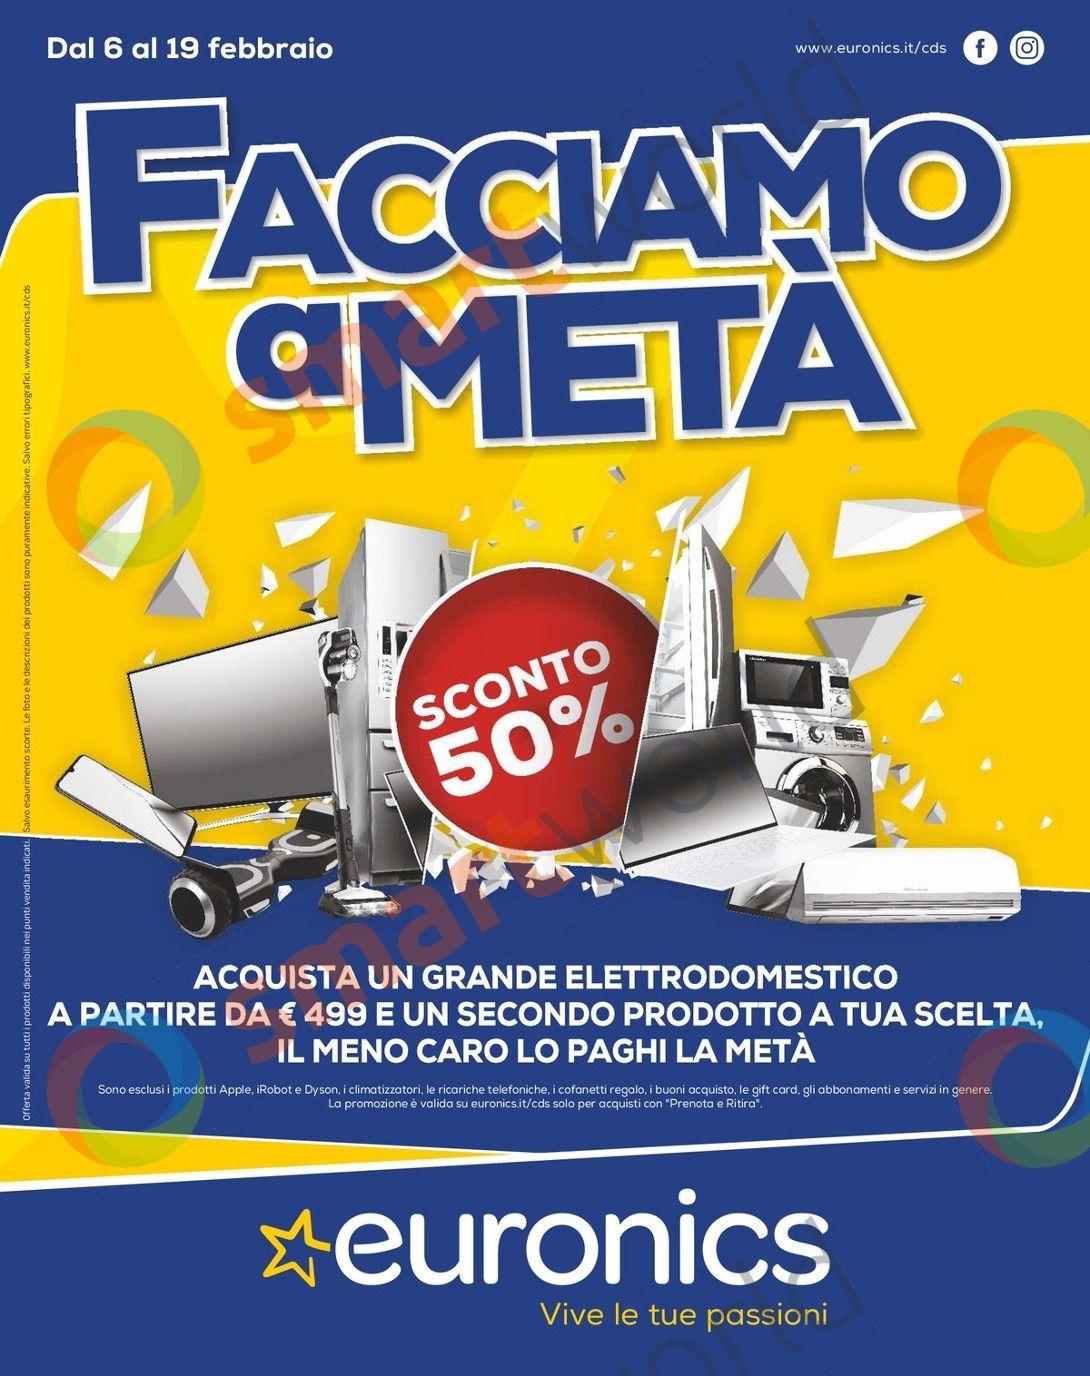 volantino euronics 6-19 febbraio 2020 cds (1)